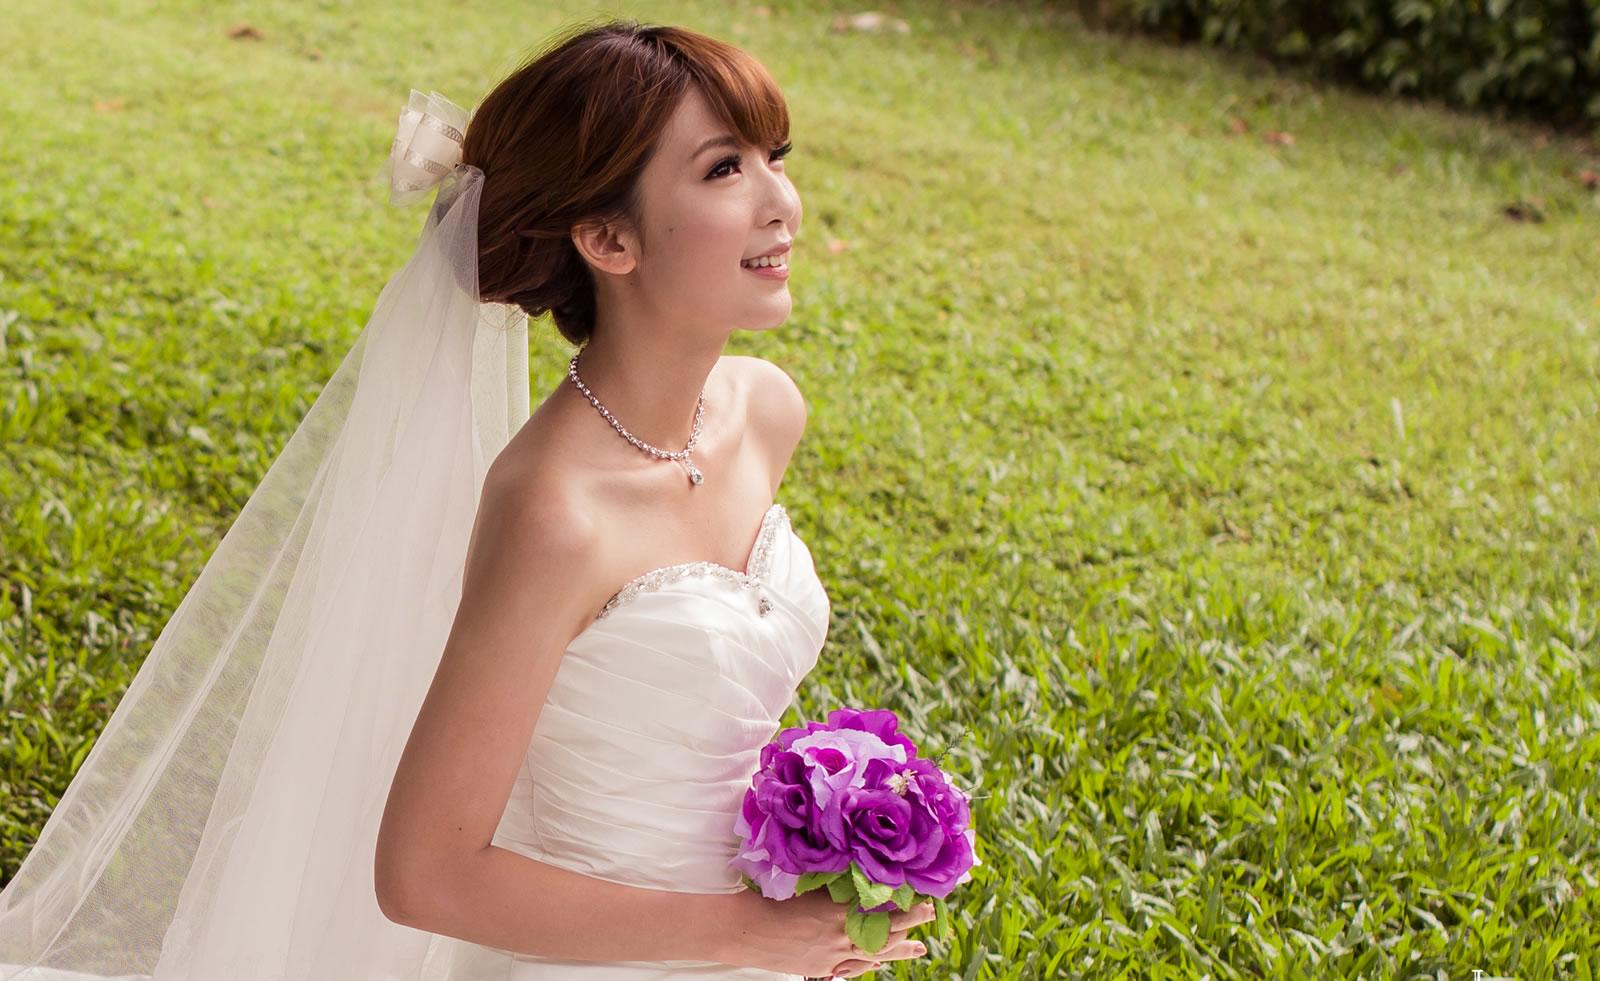 sposa cinese in abito bianco